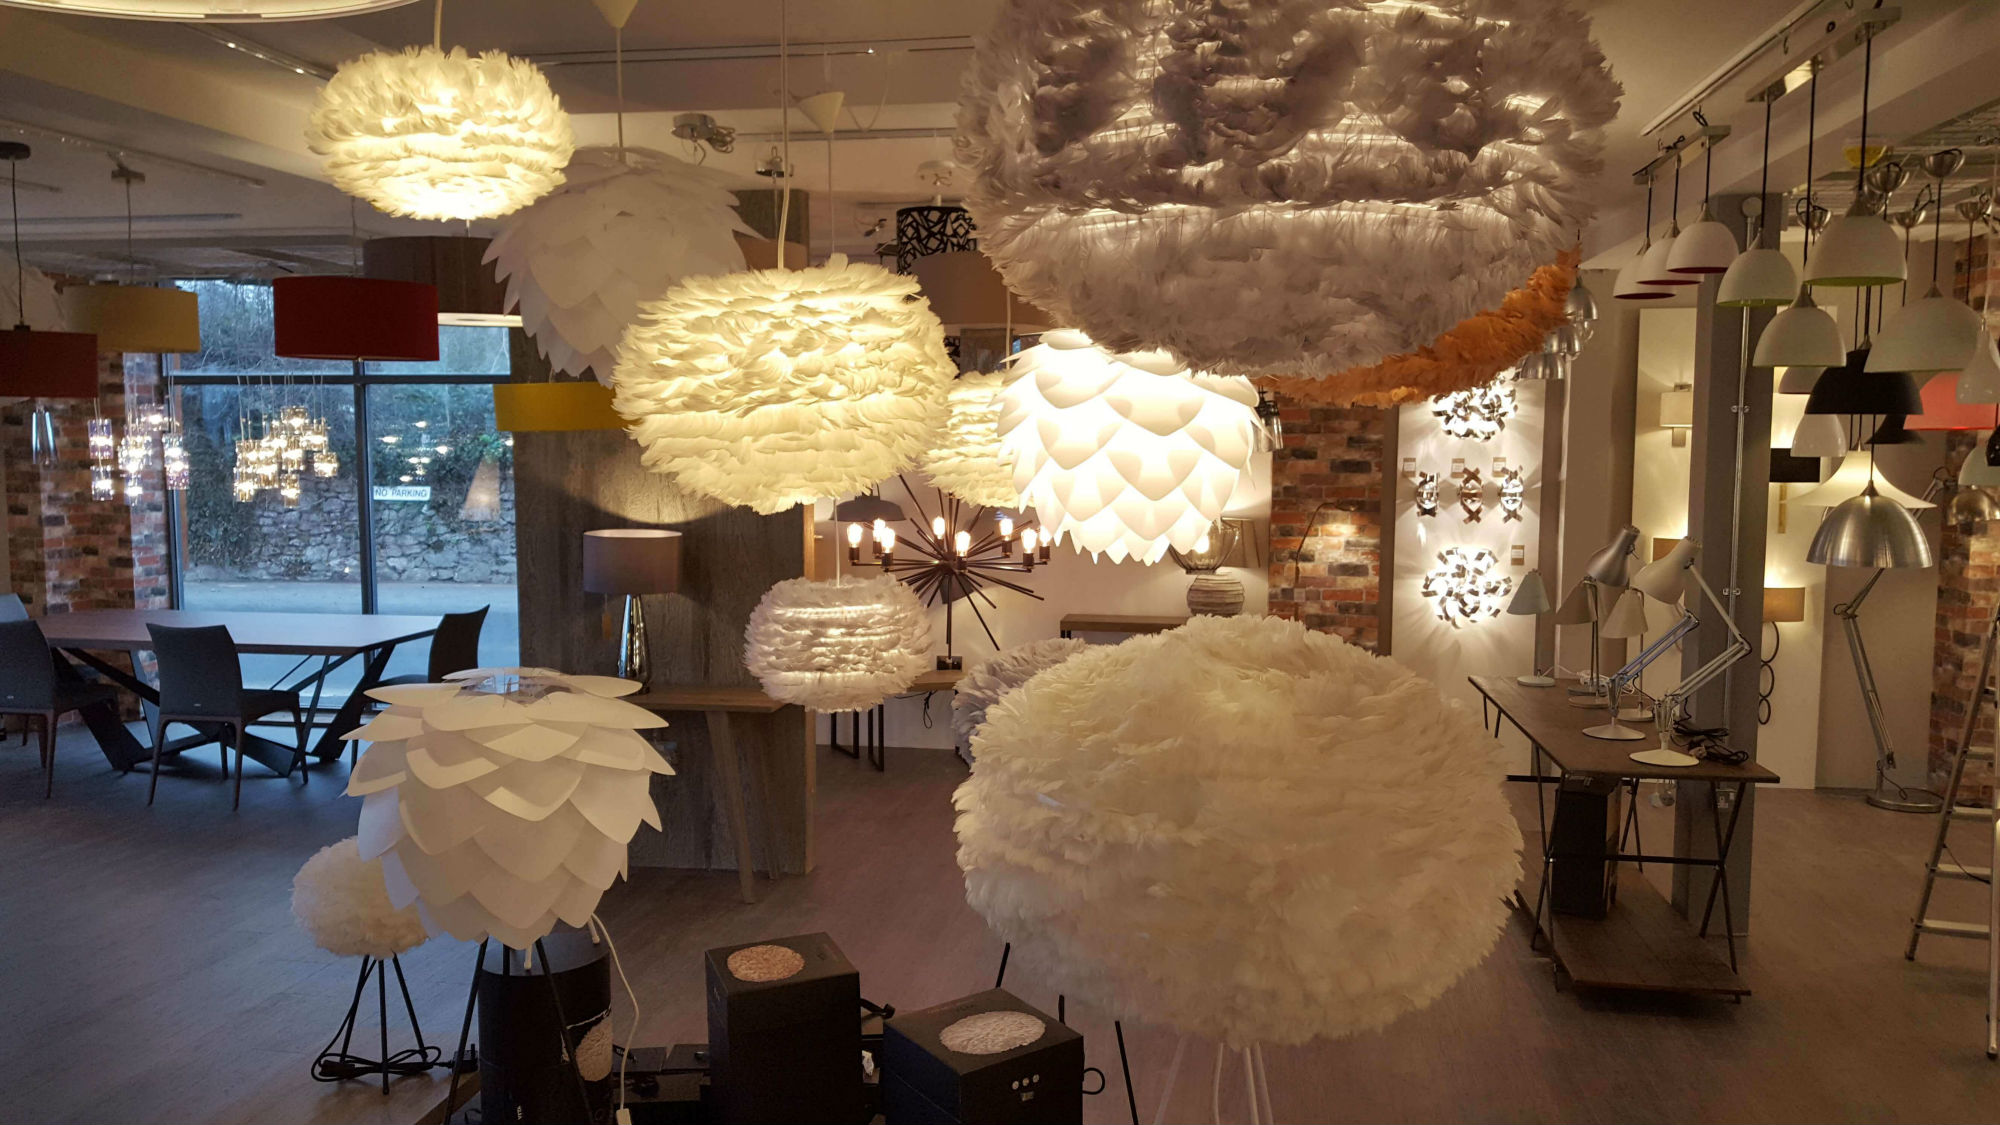 Feather February is here! Enjoy 15% off Vita Copenhagen Lighting